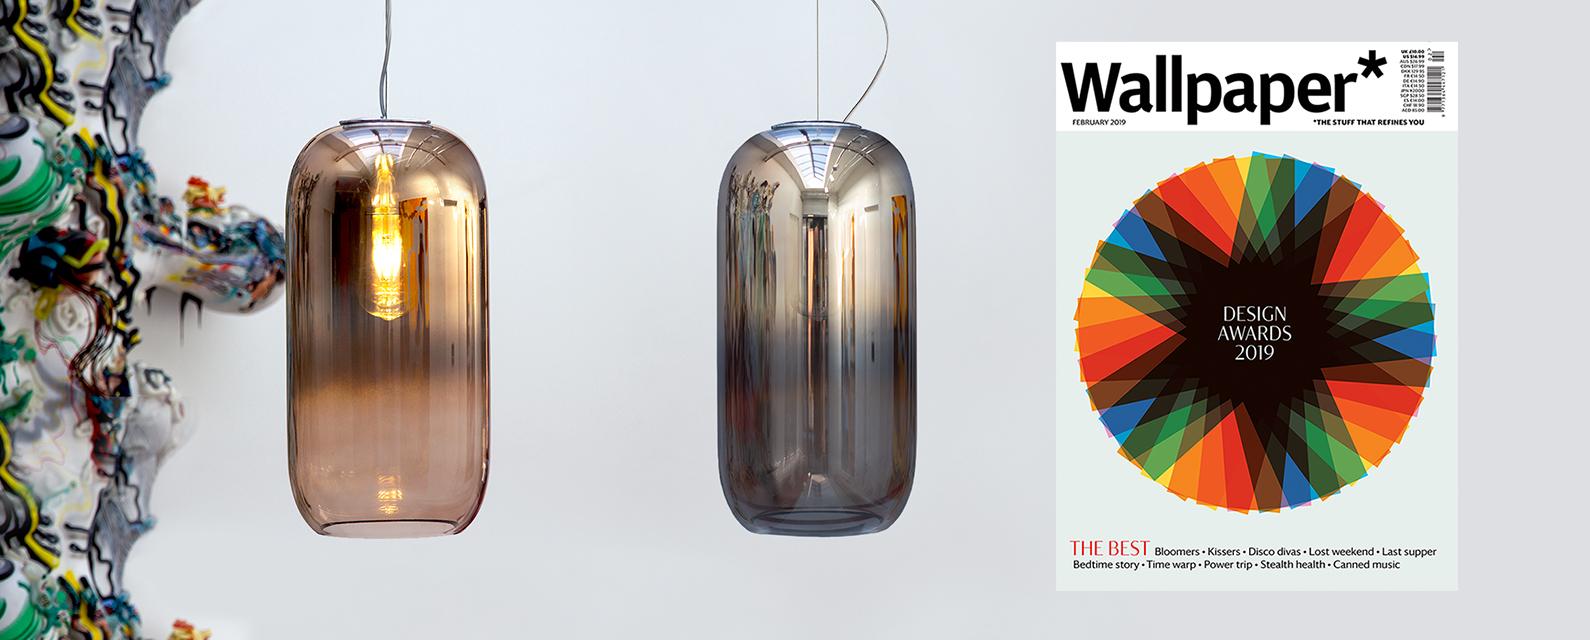 Gople-Wallpaper-Design-Awards-2019